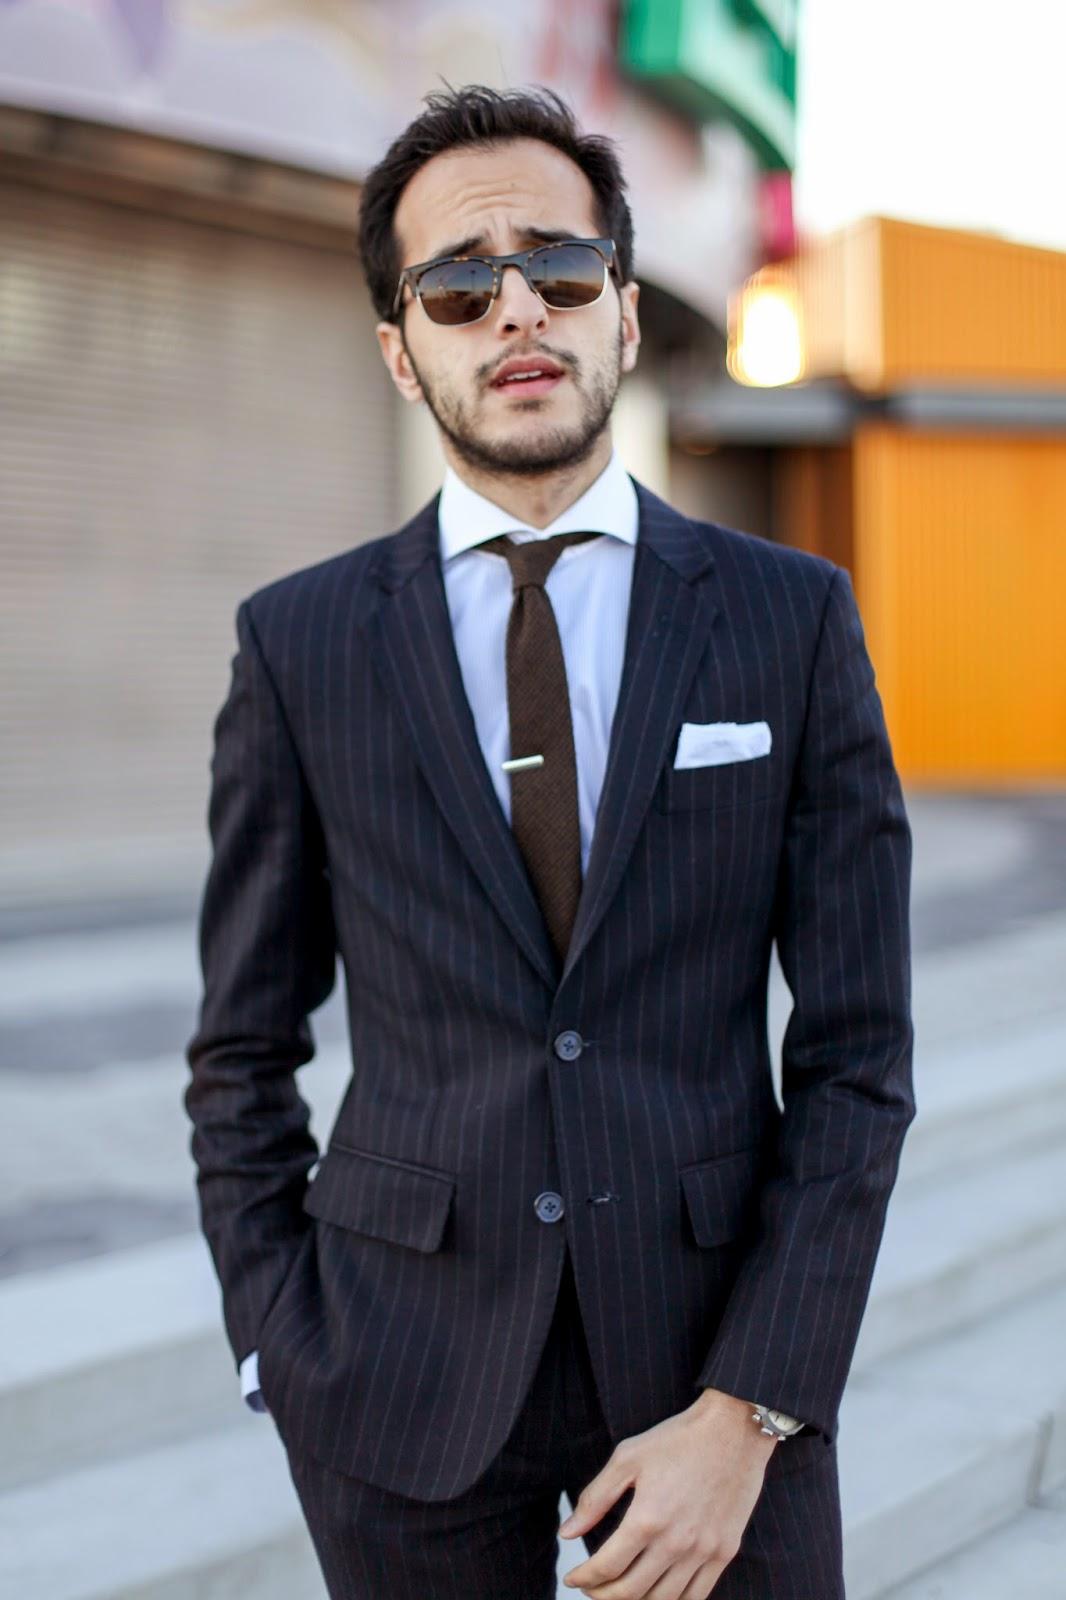 Born To Tailor Bespoke Custom Tailor Suits New York Varun Gandhi 5.JPG